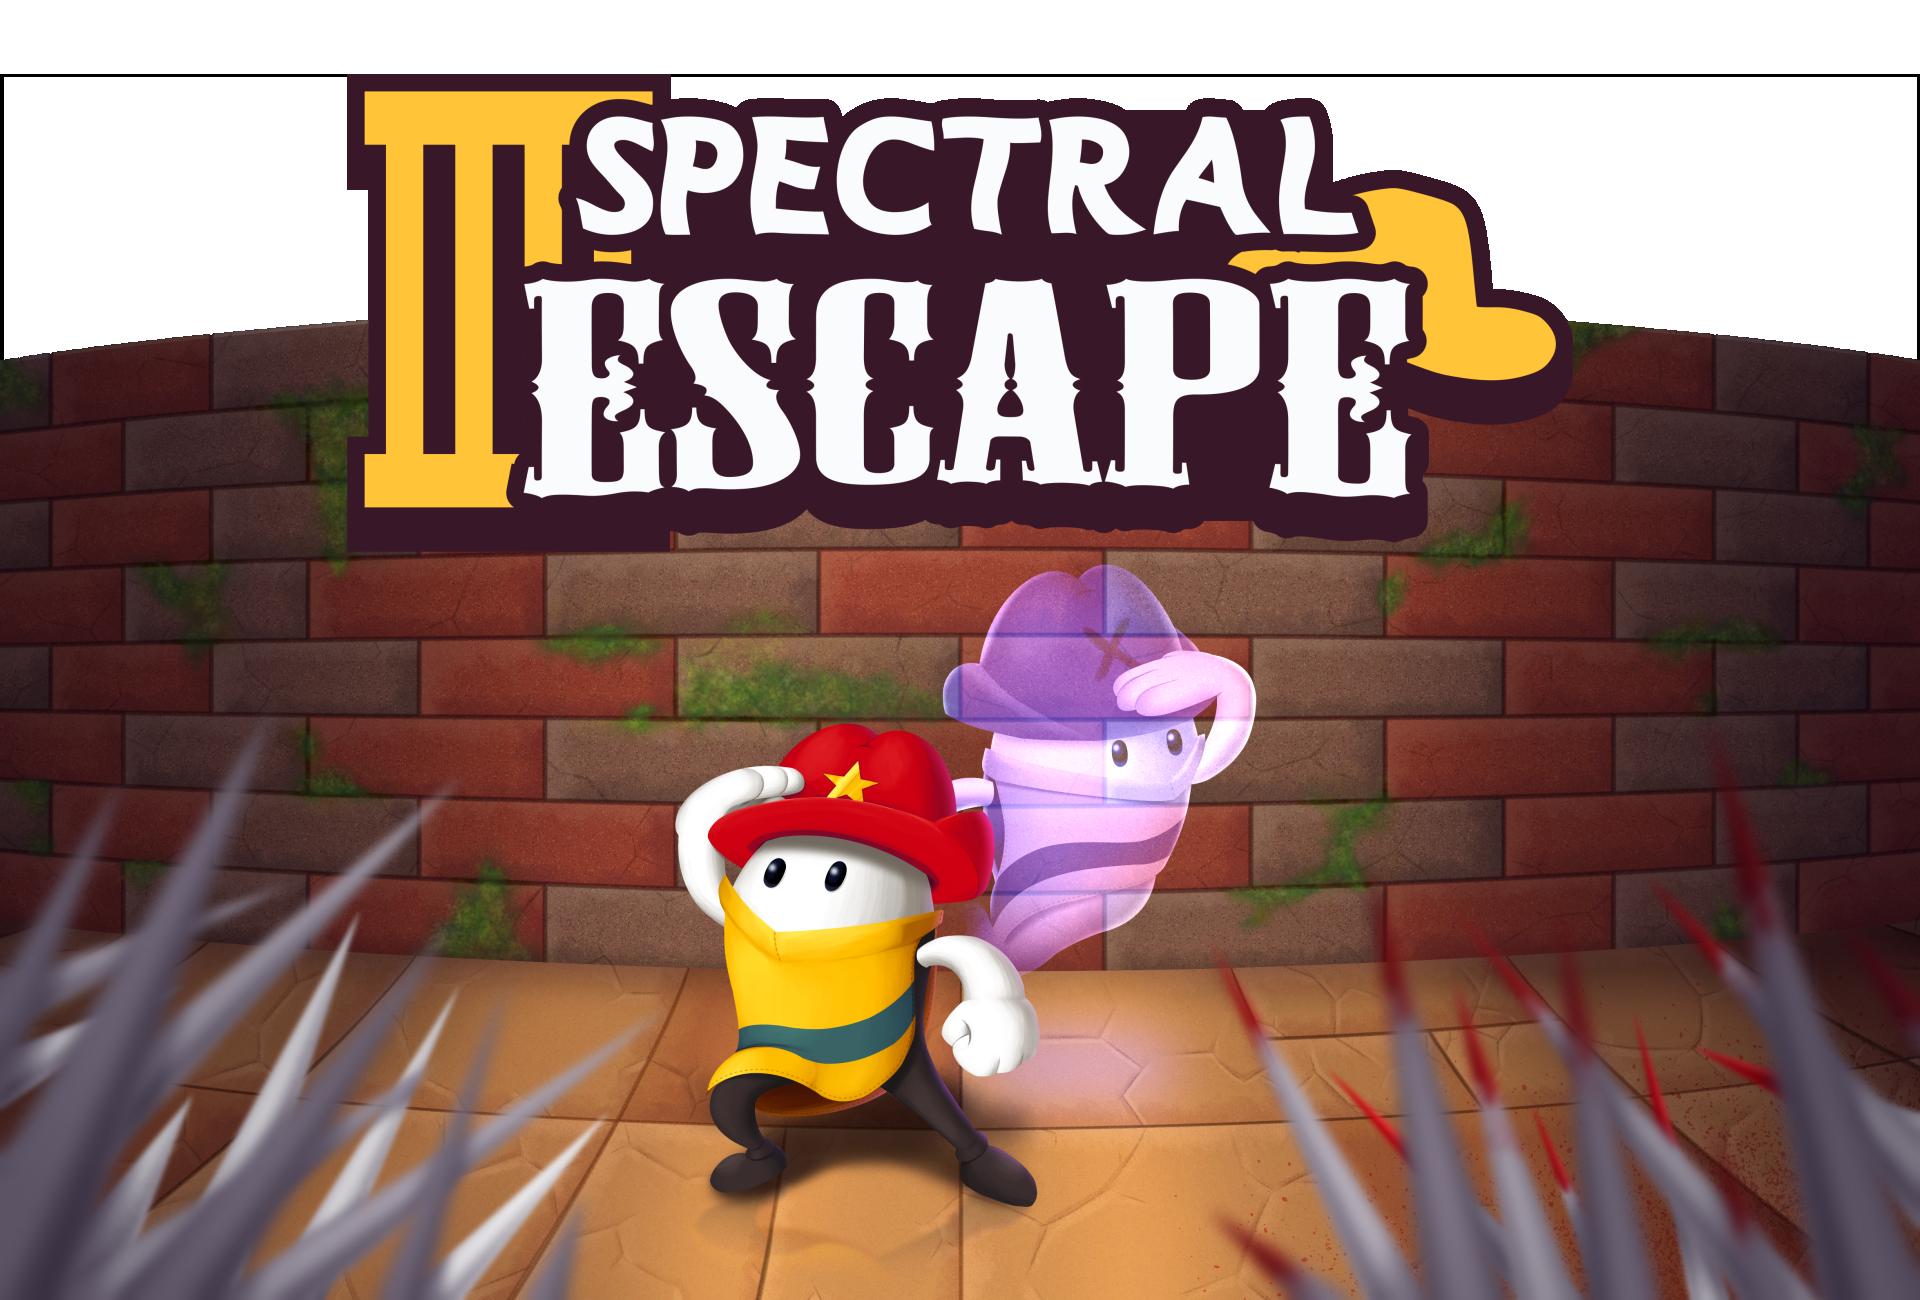 Spectral Escape